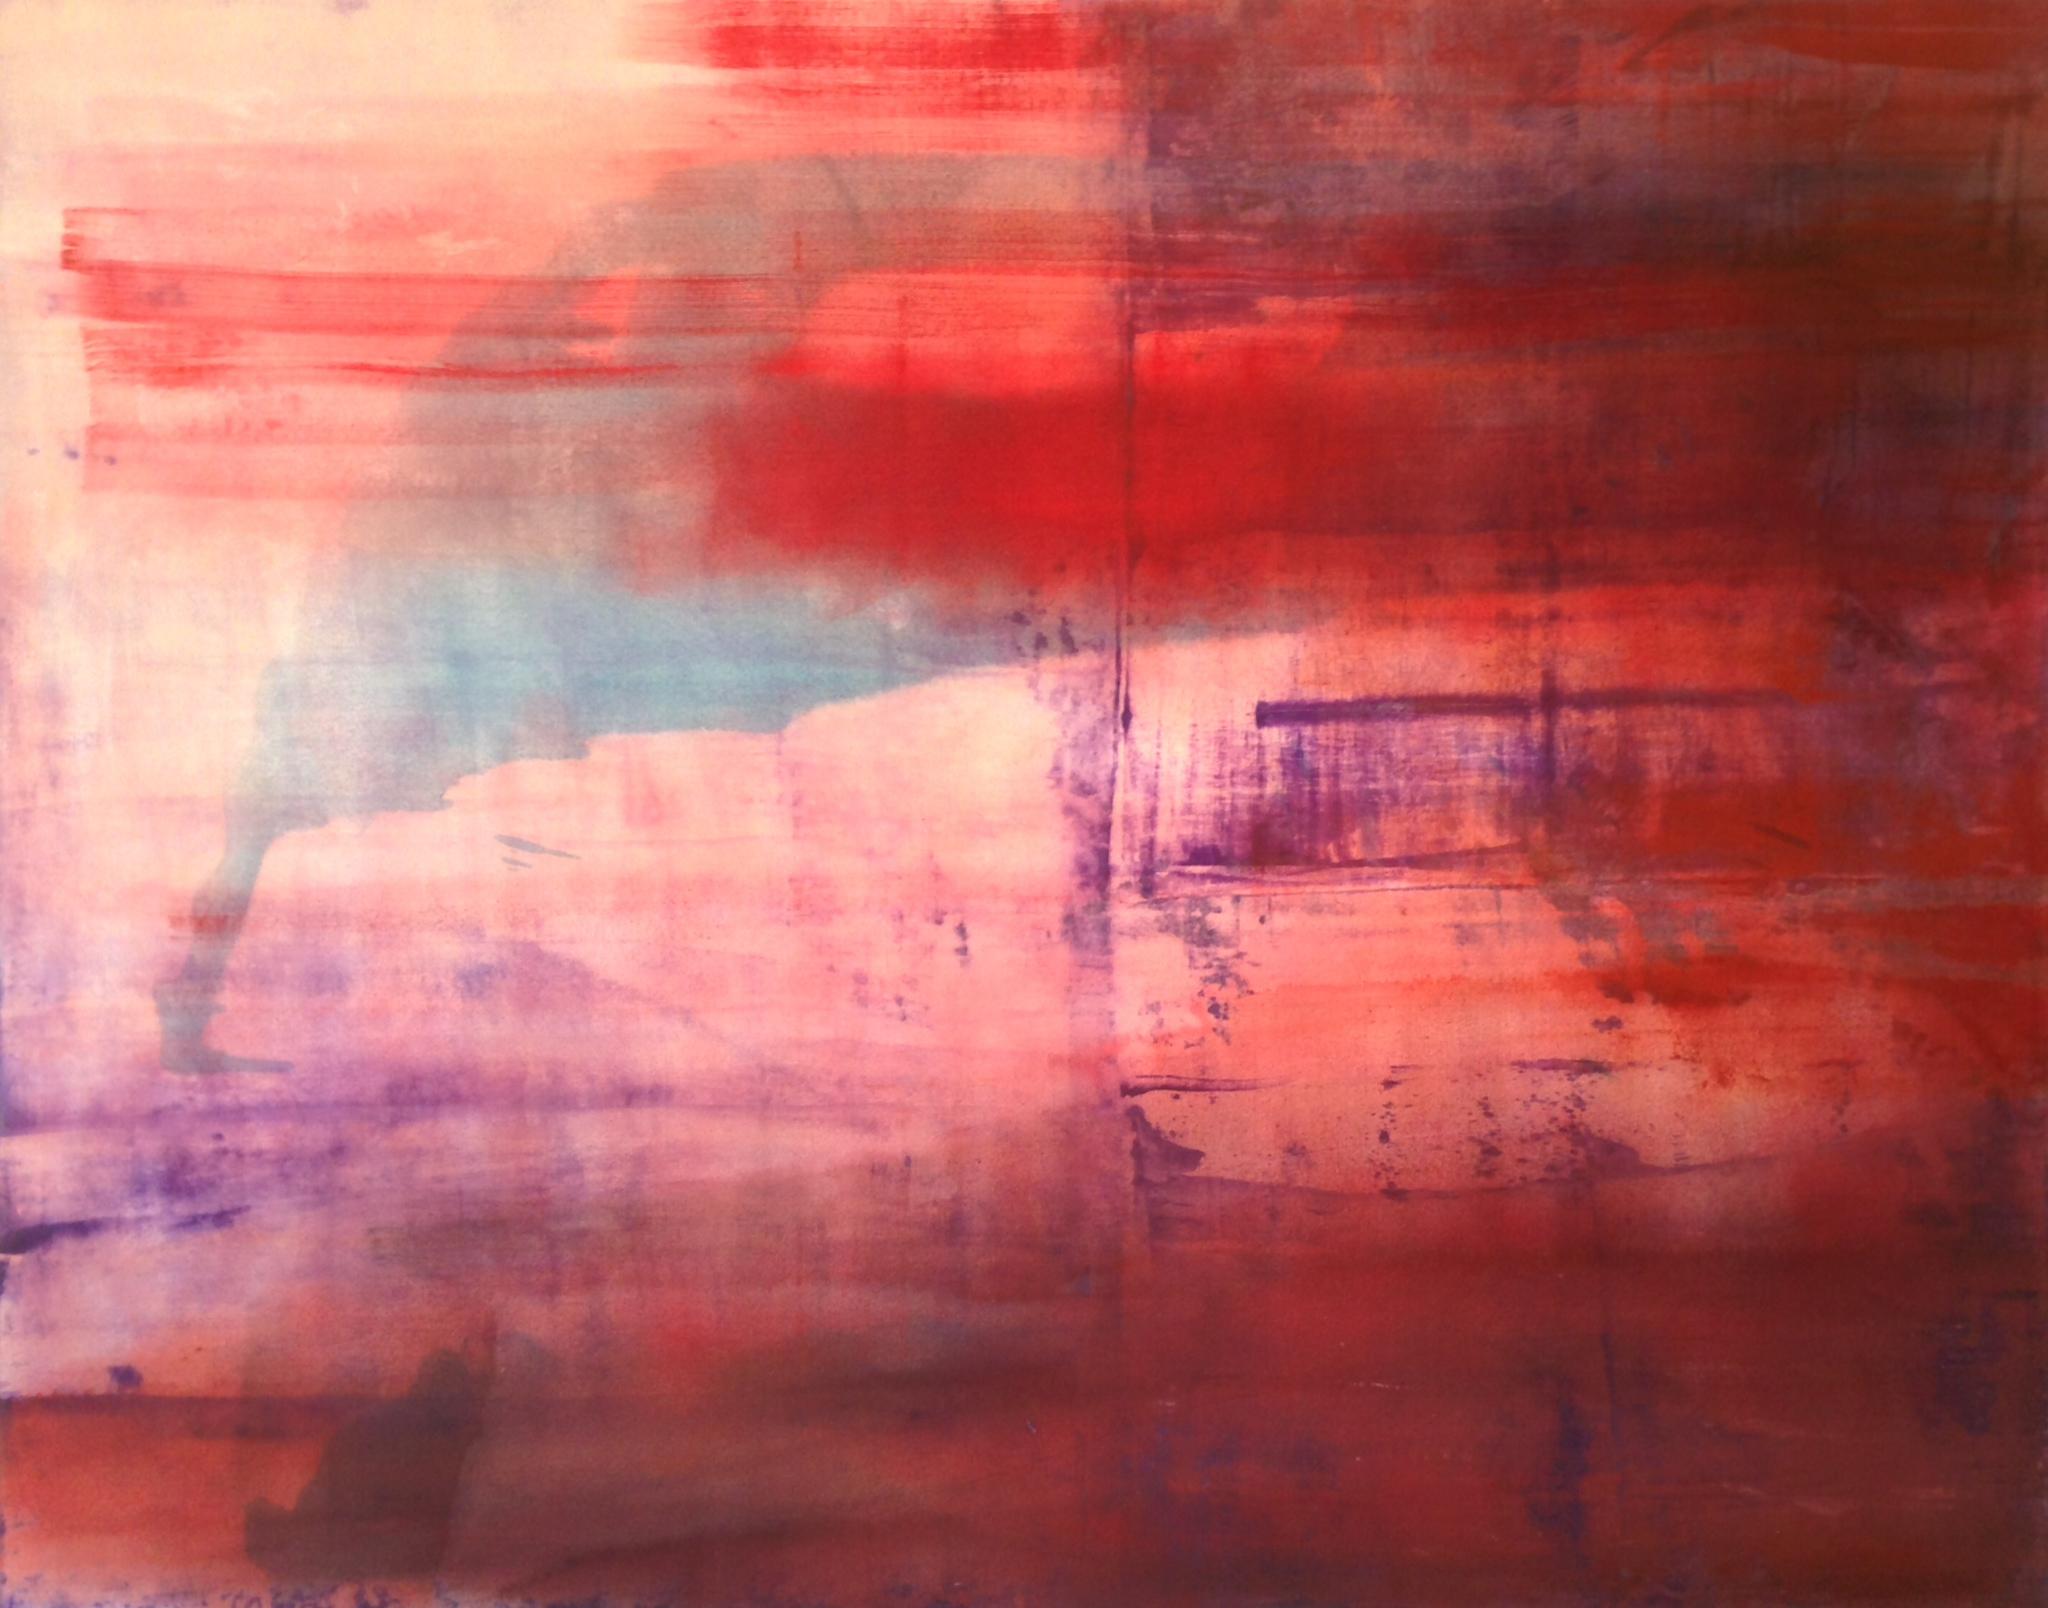 "1446, oil and acrylic on canvas, 48"" x 60"", $5,000"